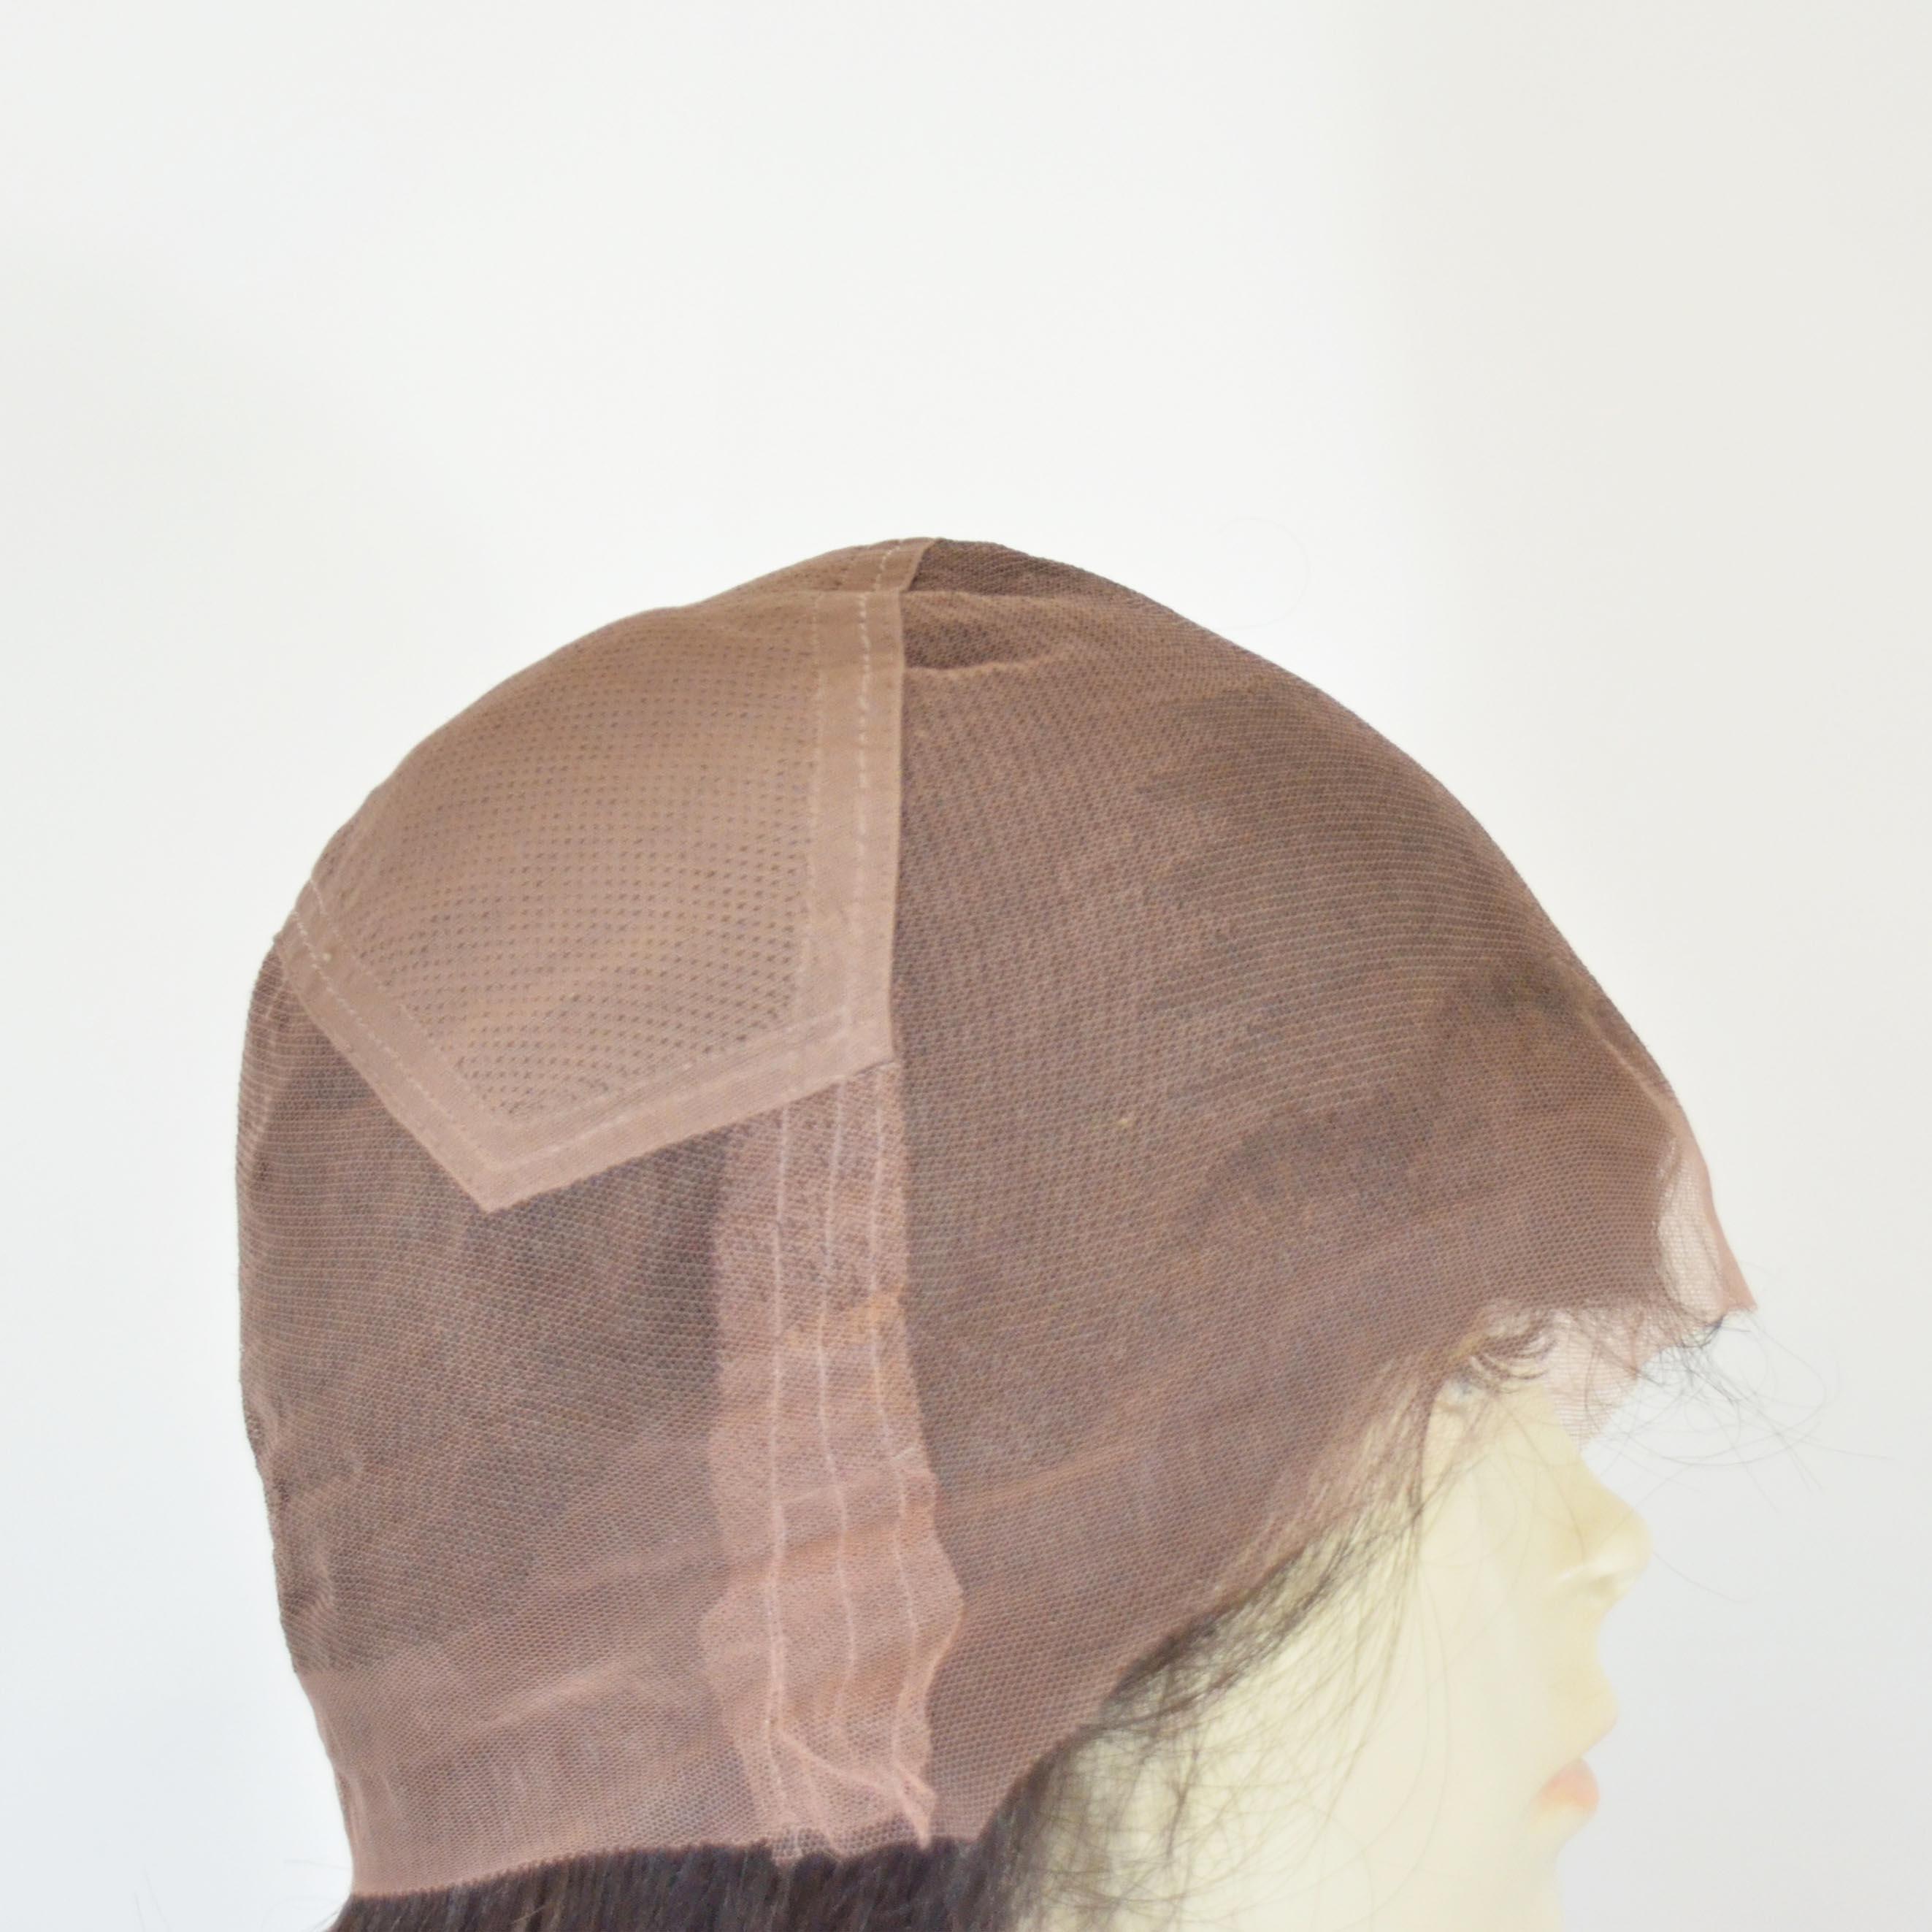 Prótese Inteira com tela Full Lace Wig - Cabelo Indiano Humano